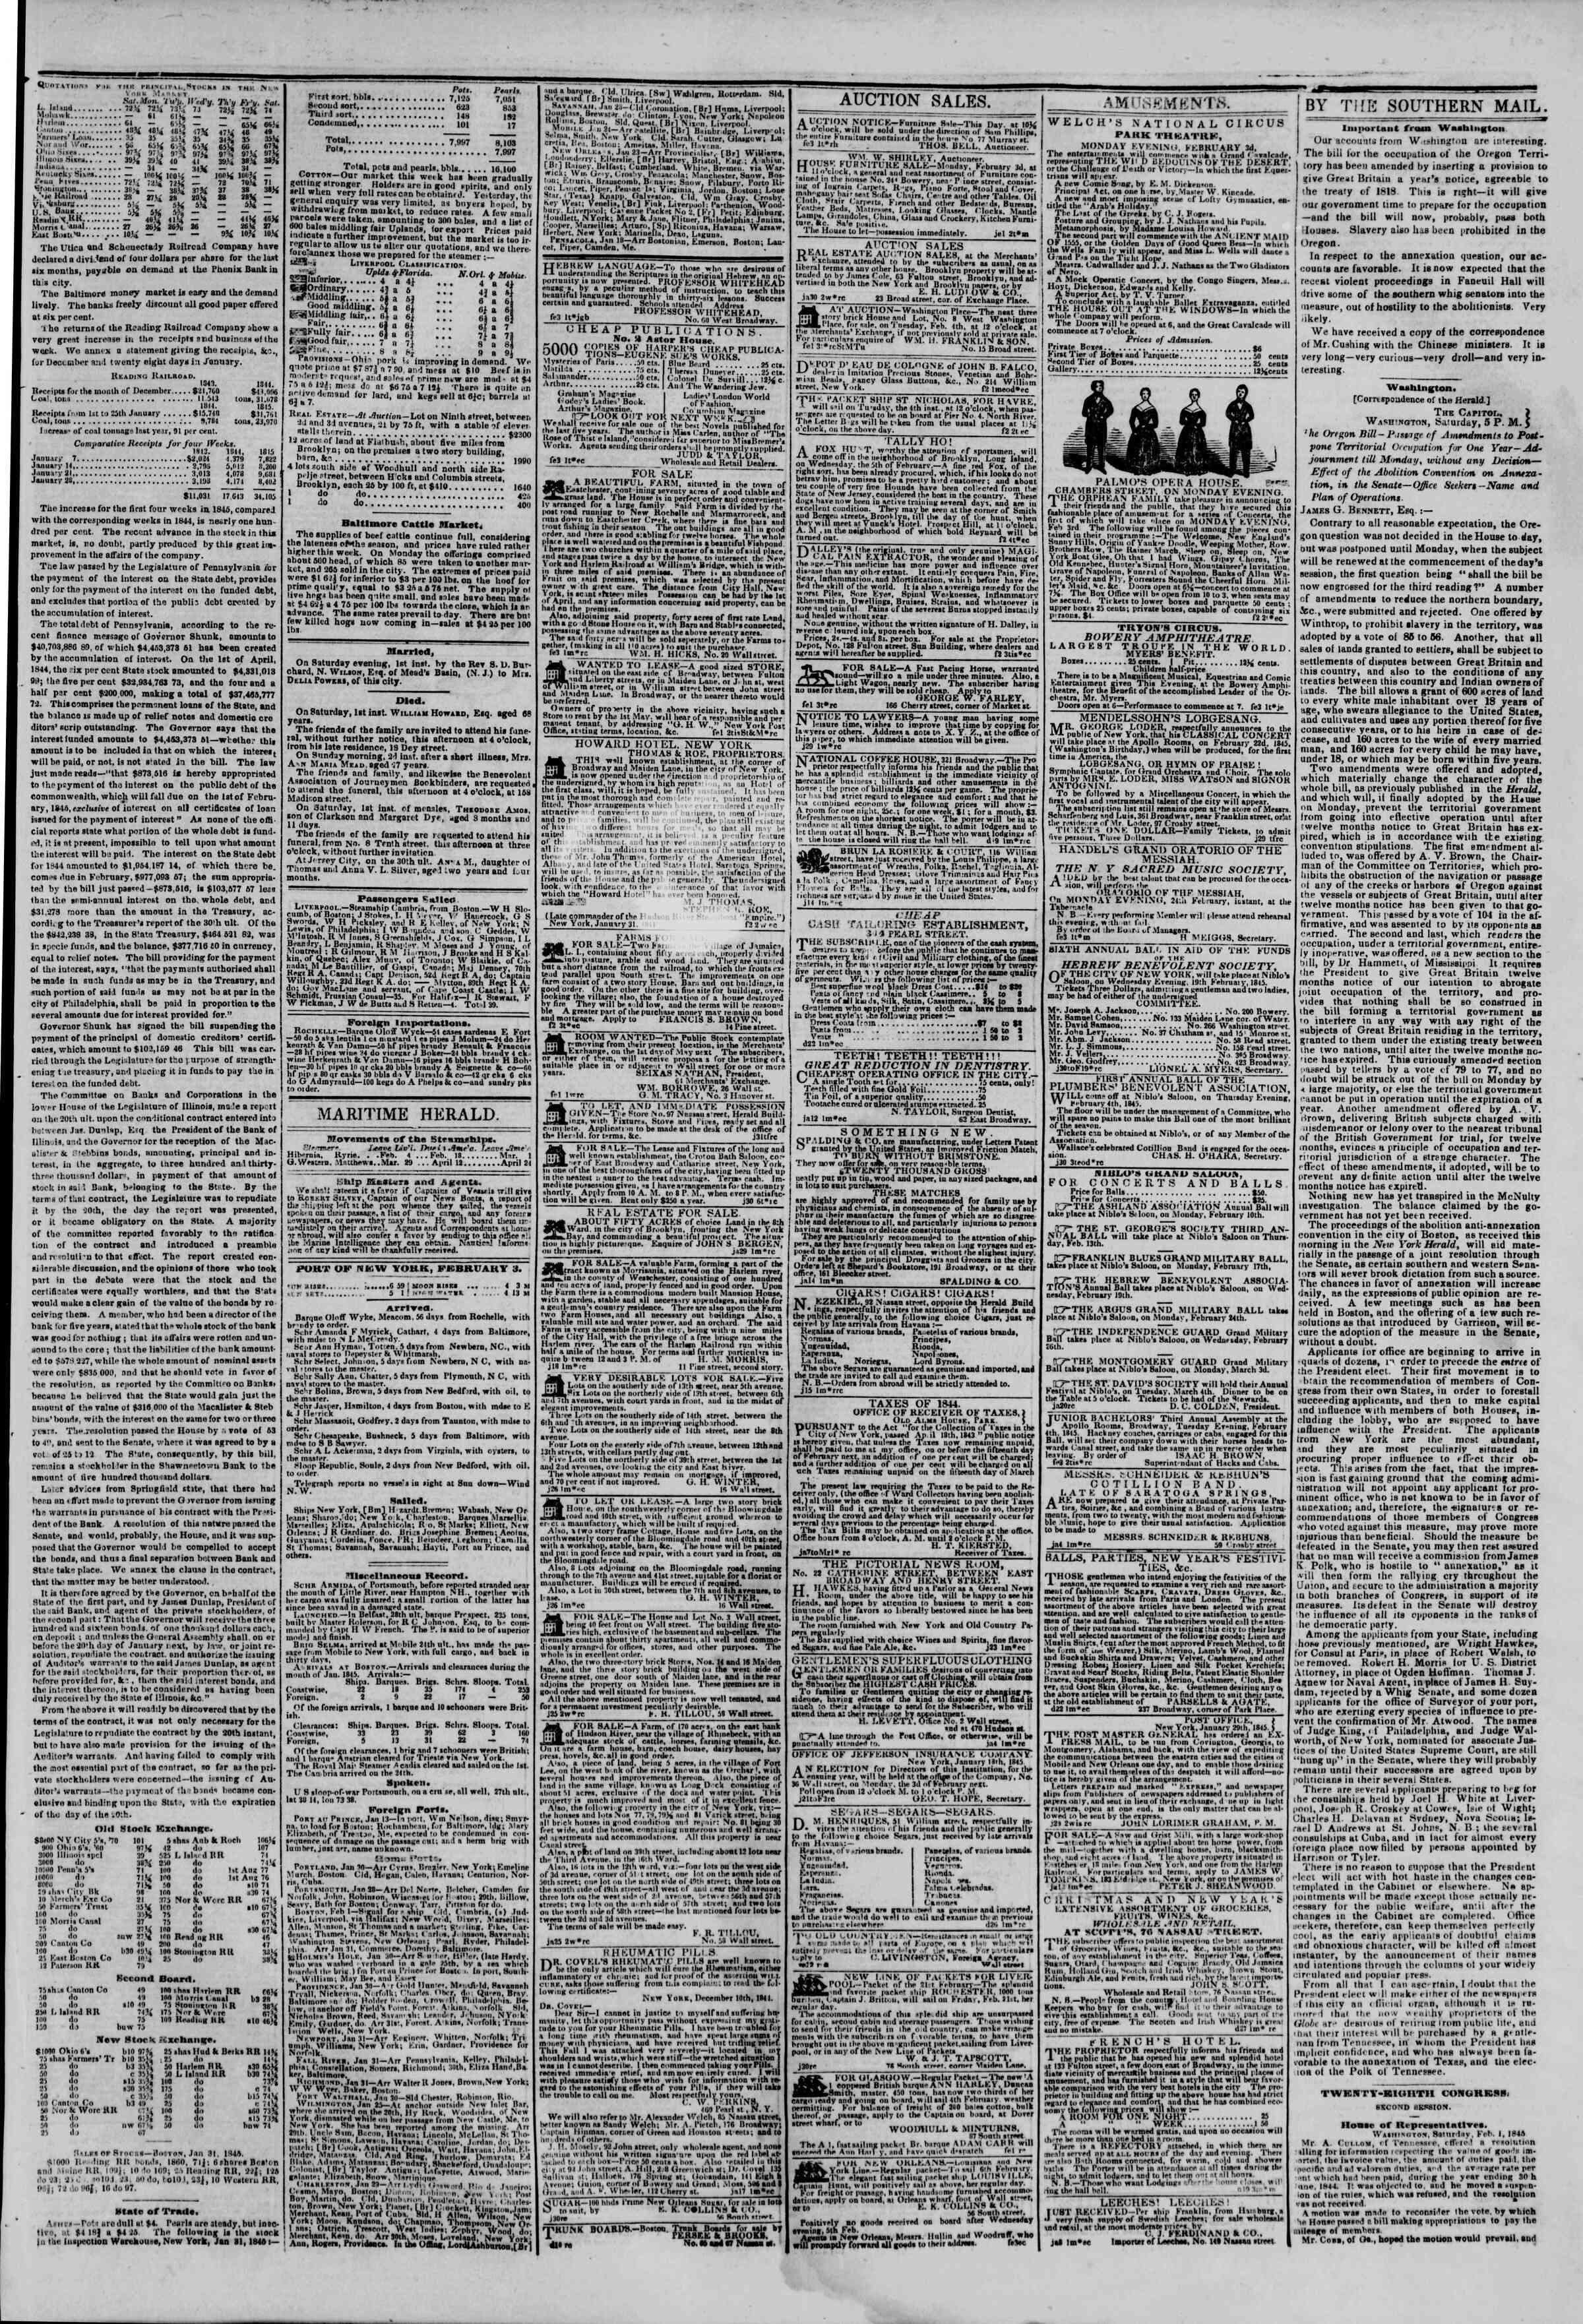 February 3, 1845 Tarihli The New York Herald Gazetesi Sayfa 3